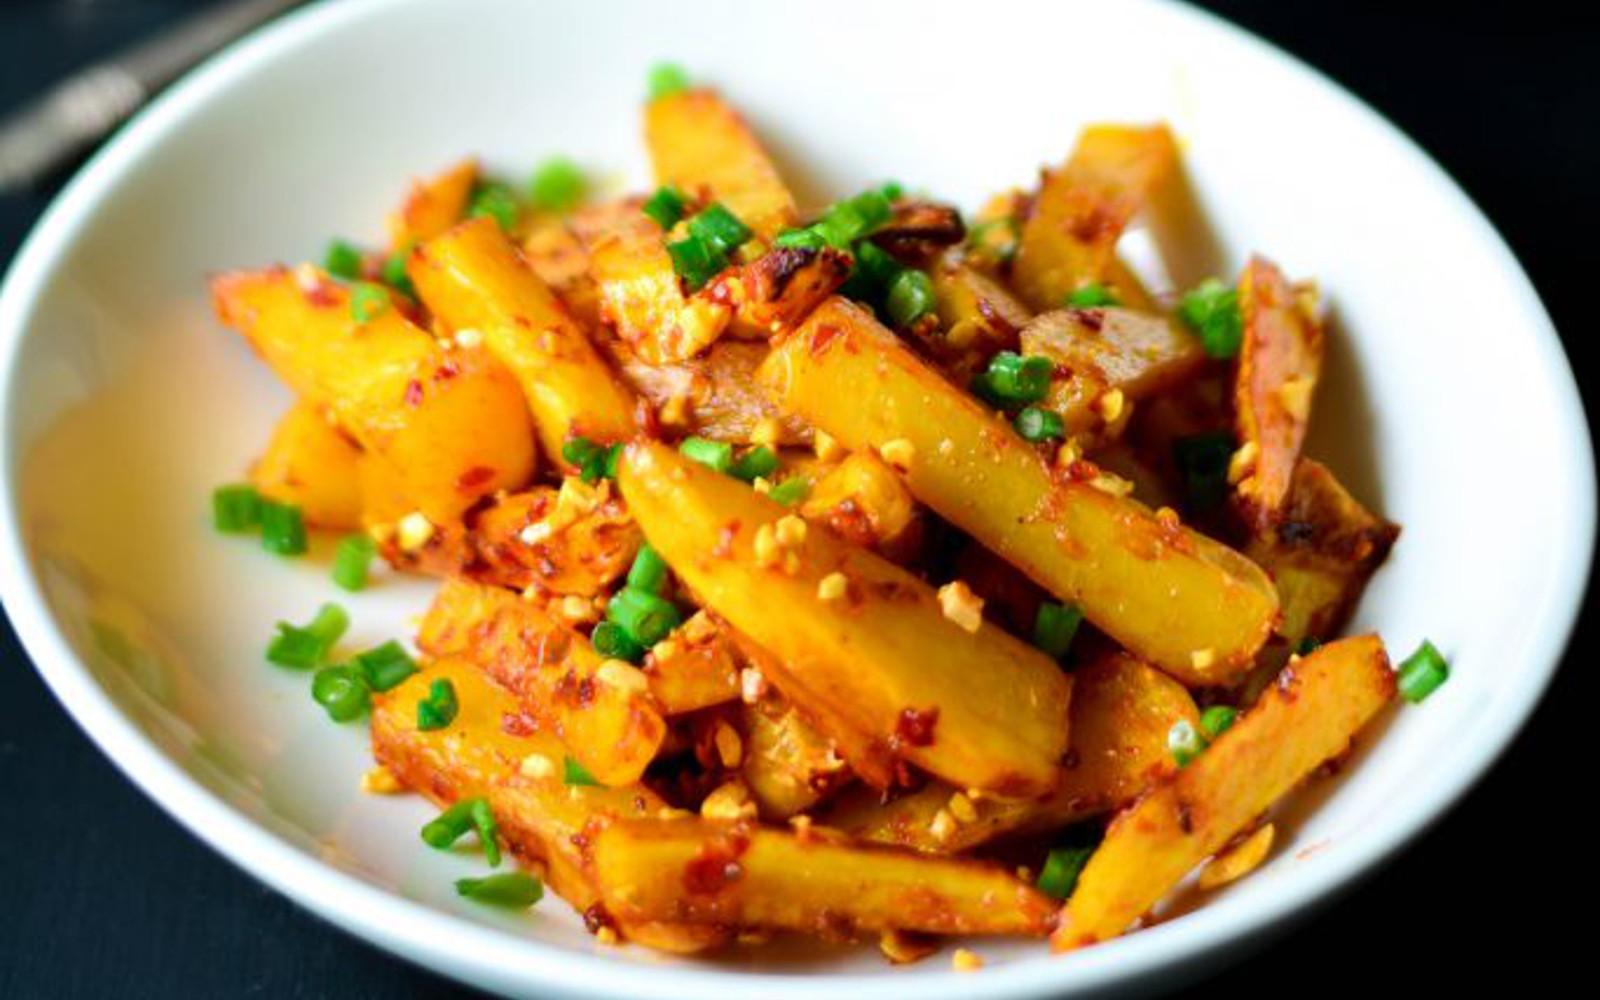 Baked Indonesian Chili Garlic Fries